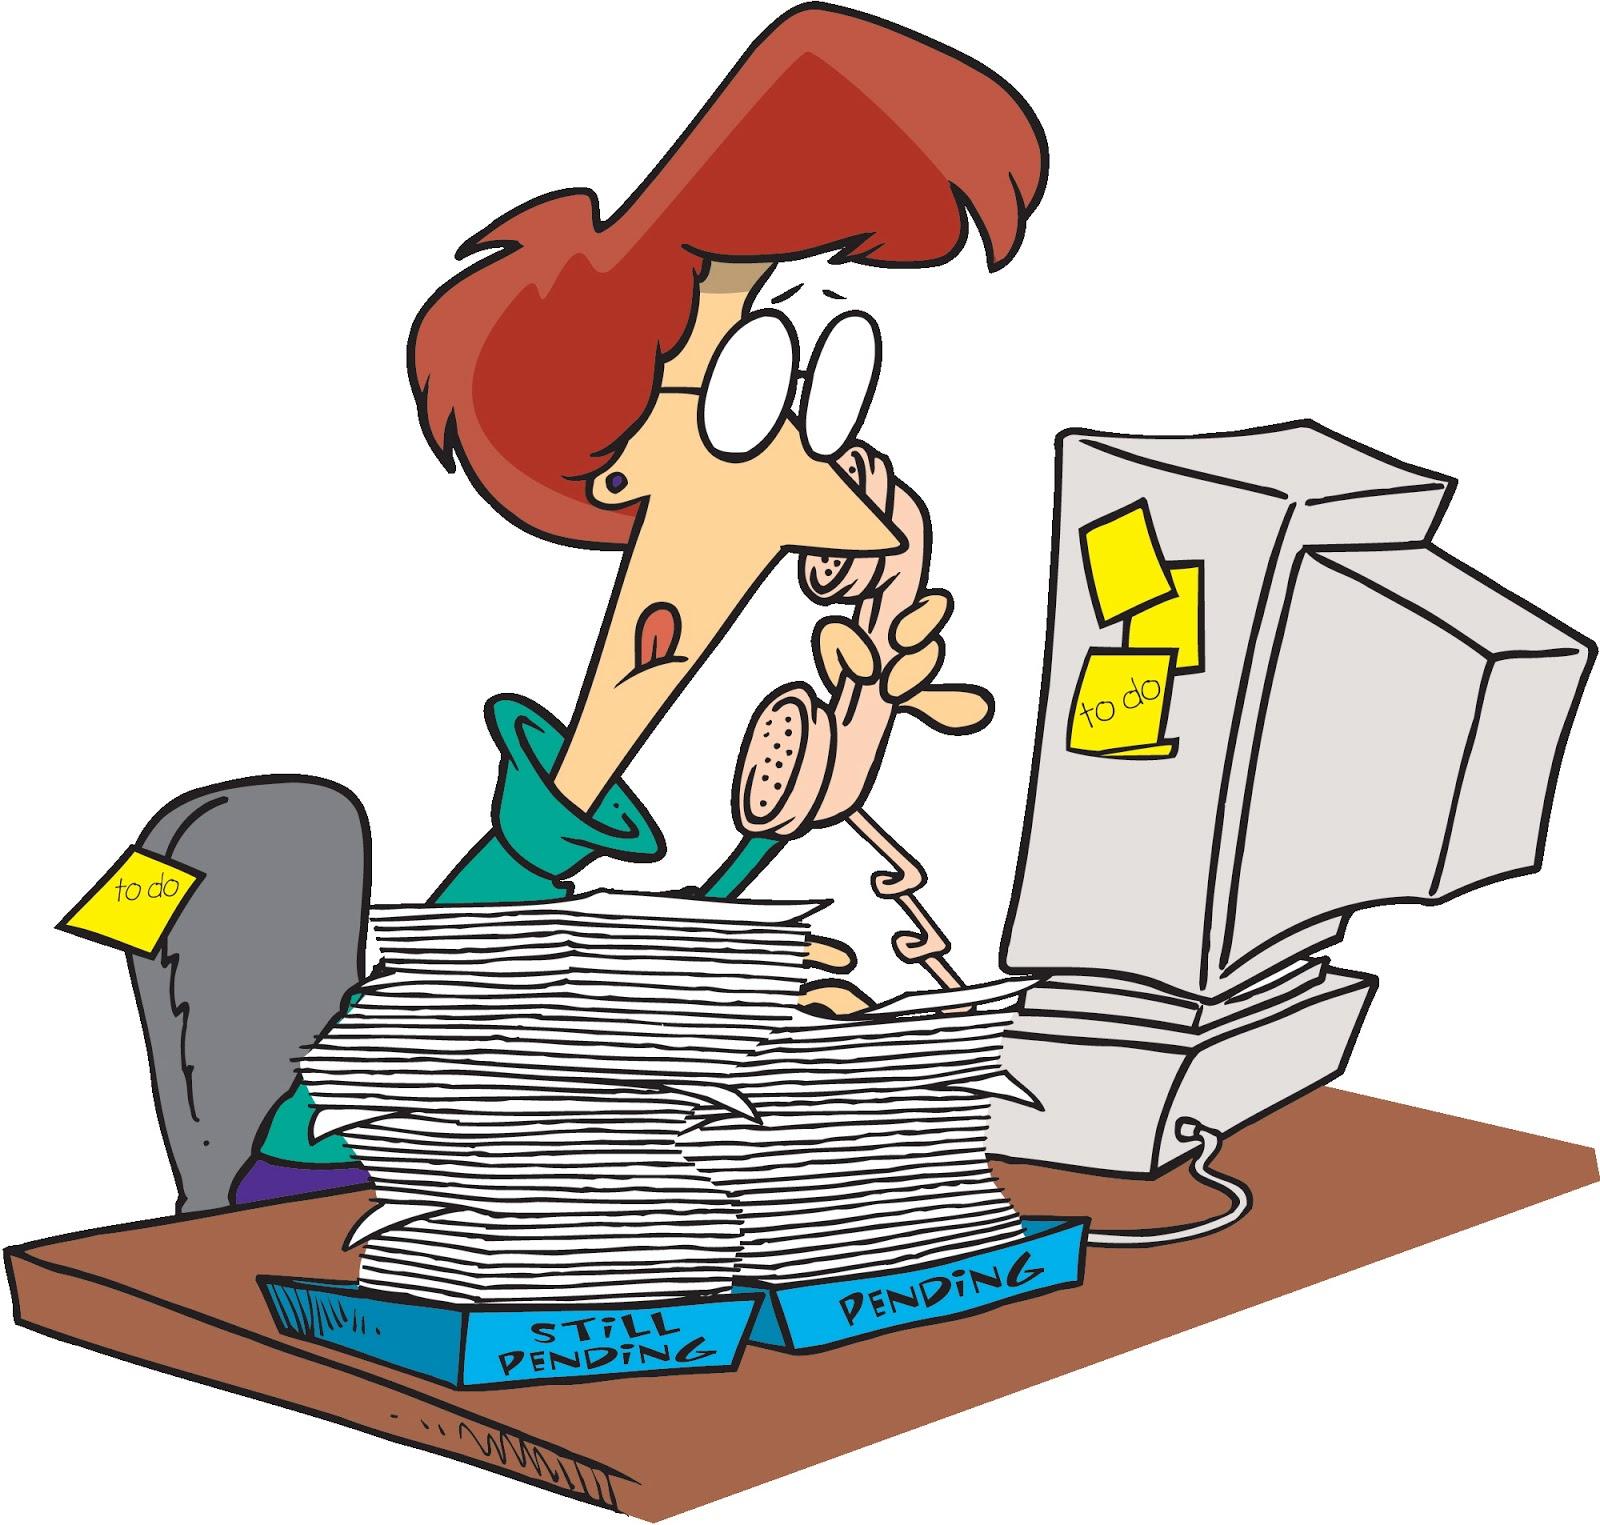 clipart free Secretary clipart. Free cliparts download clip.